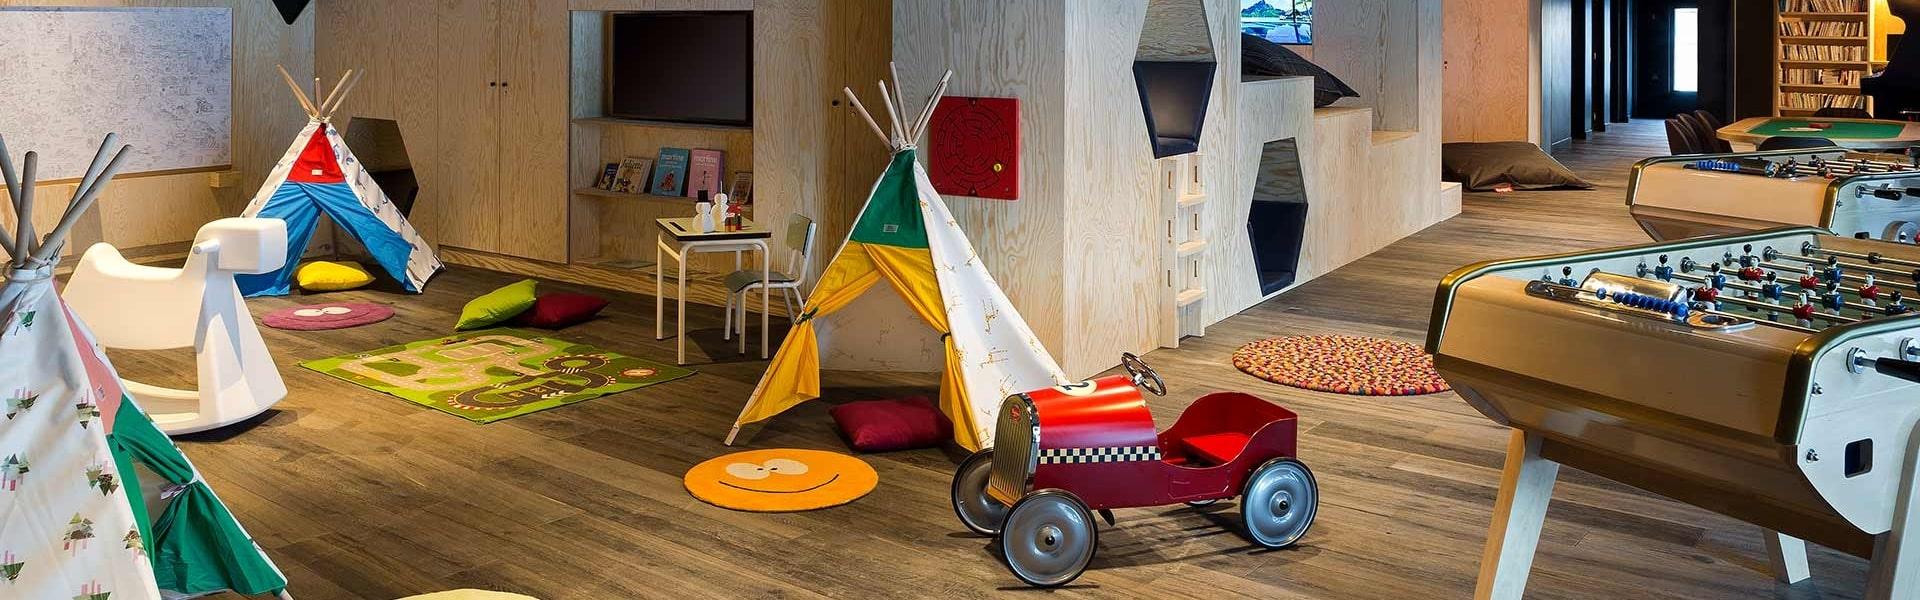 Araucaria Hotel & Spa La Plagne - espace enfants